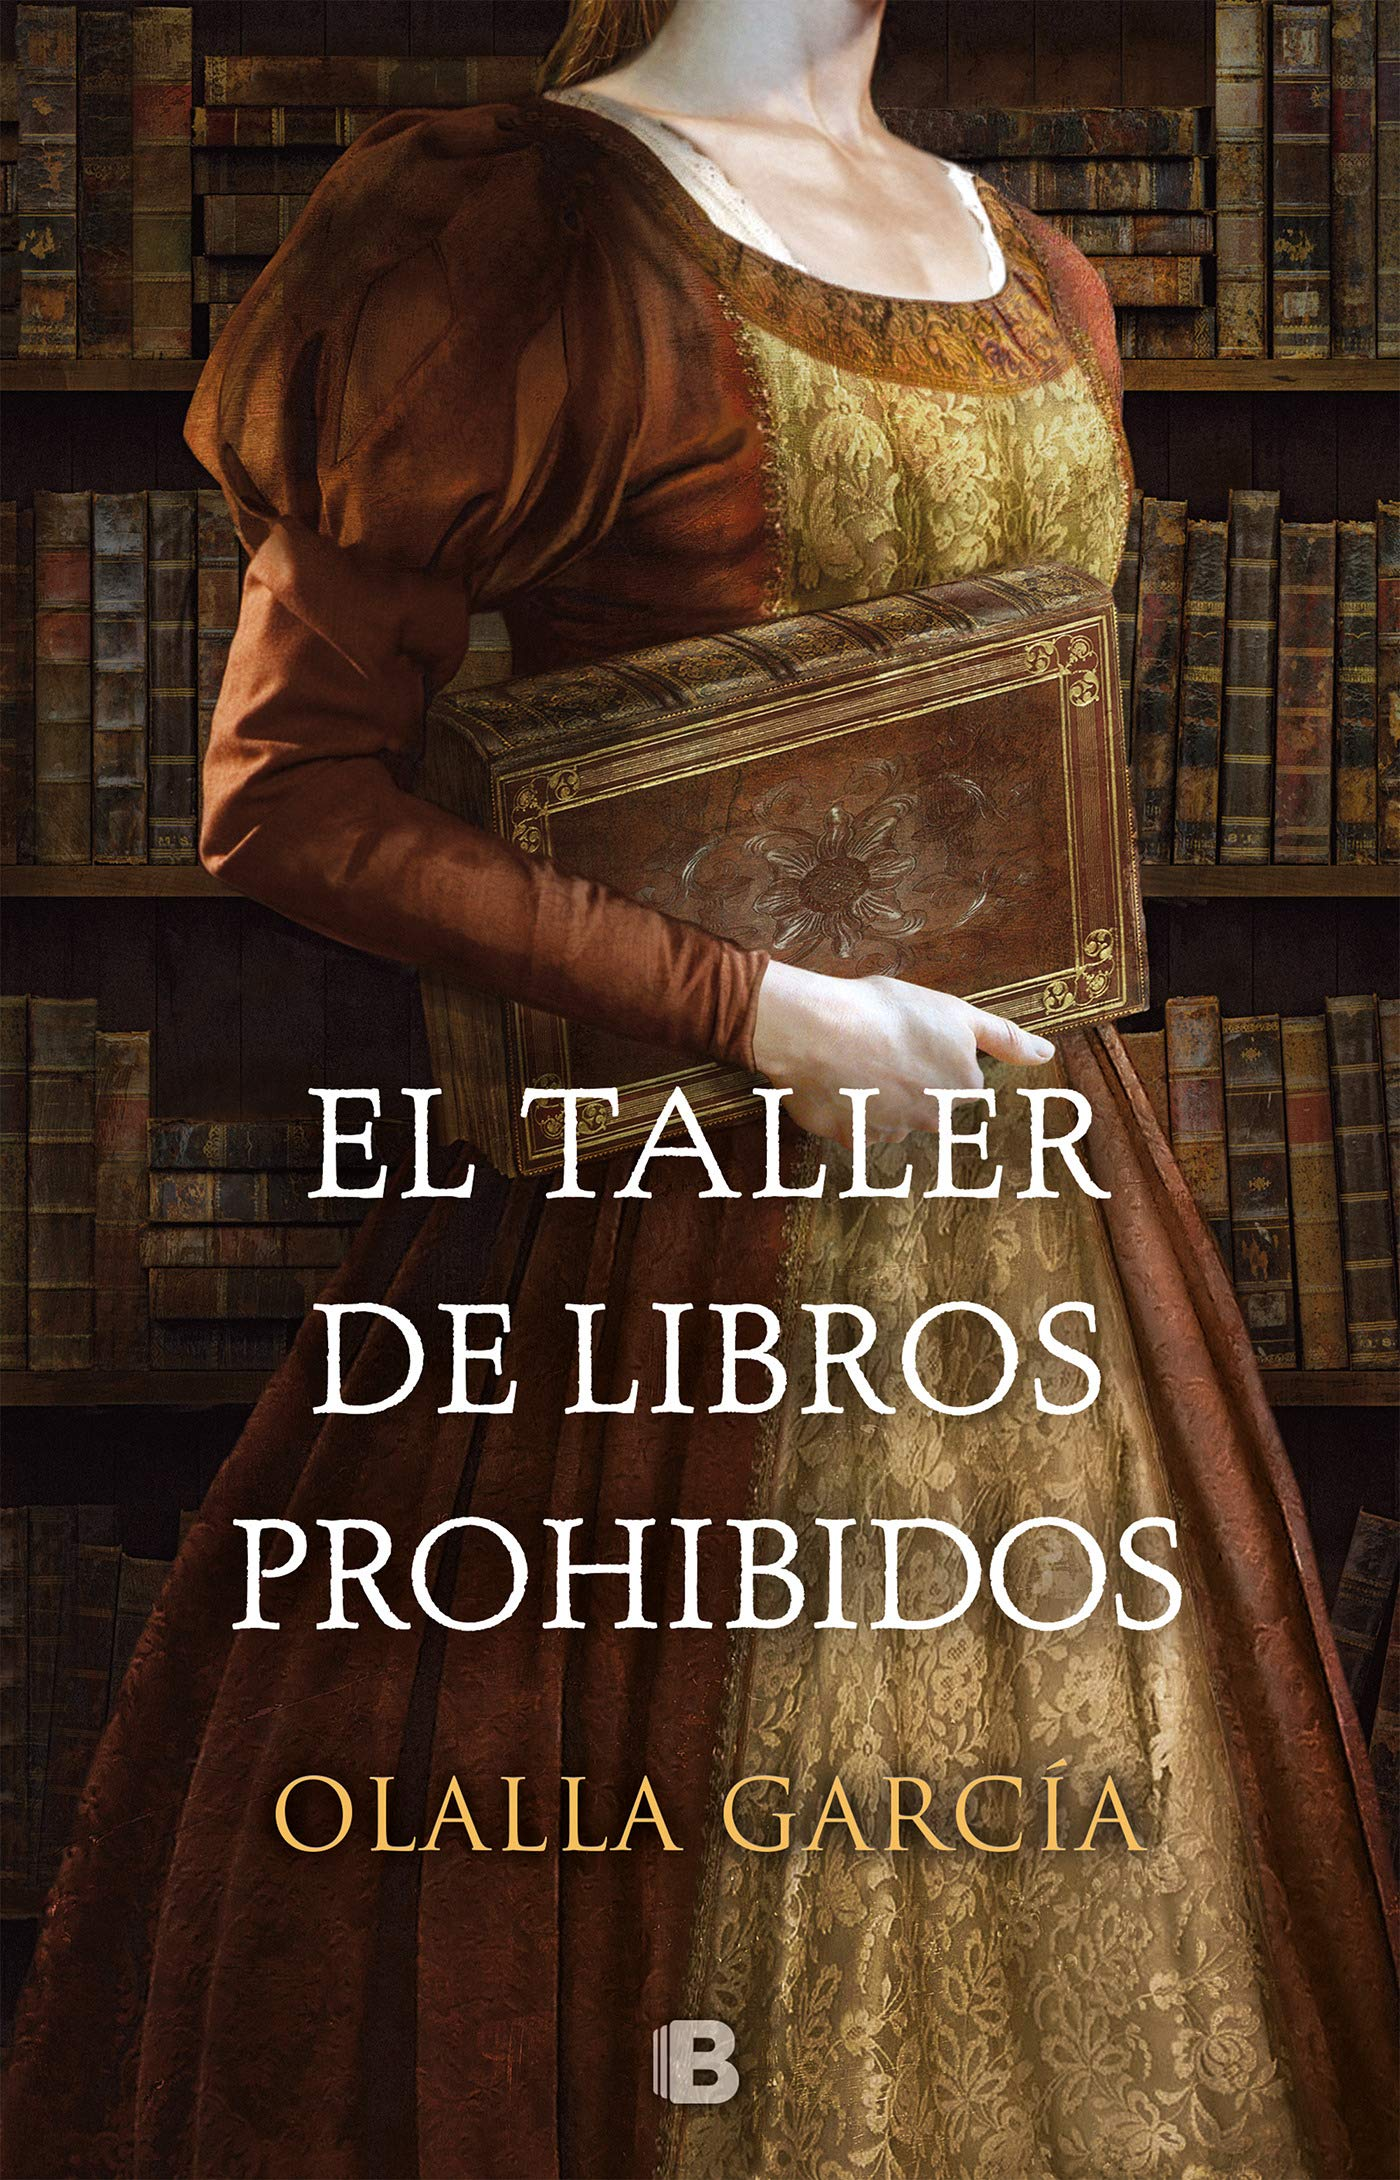 El taller de libros prohibidos (Histórica): Amazon.es: Olalla García: Libros